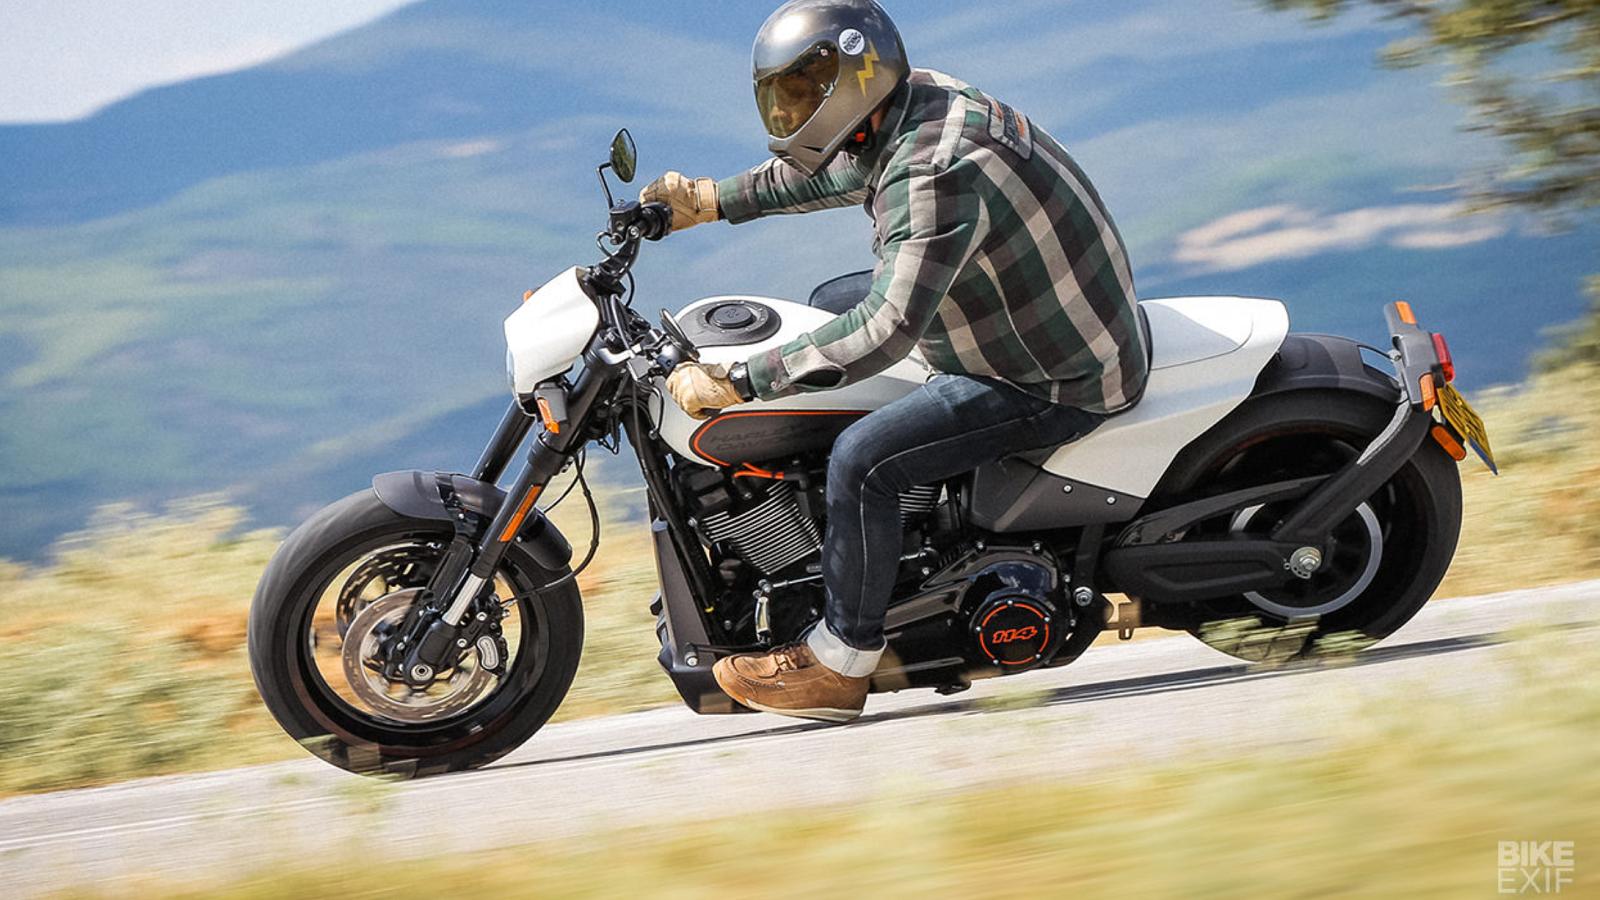 2019 Harley-Davidson FXDR 114 Is a Rowdy, Fun Ride